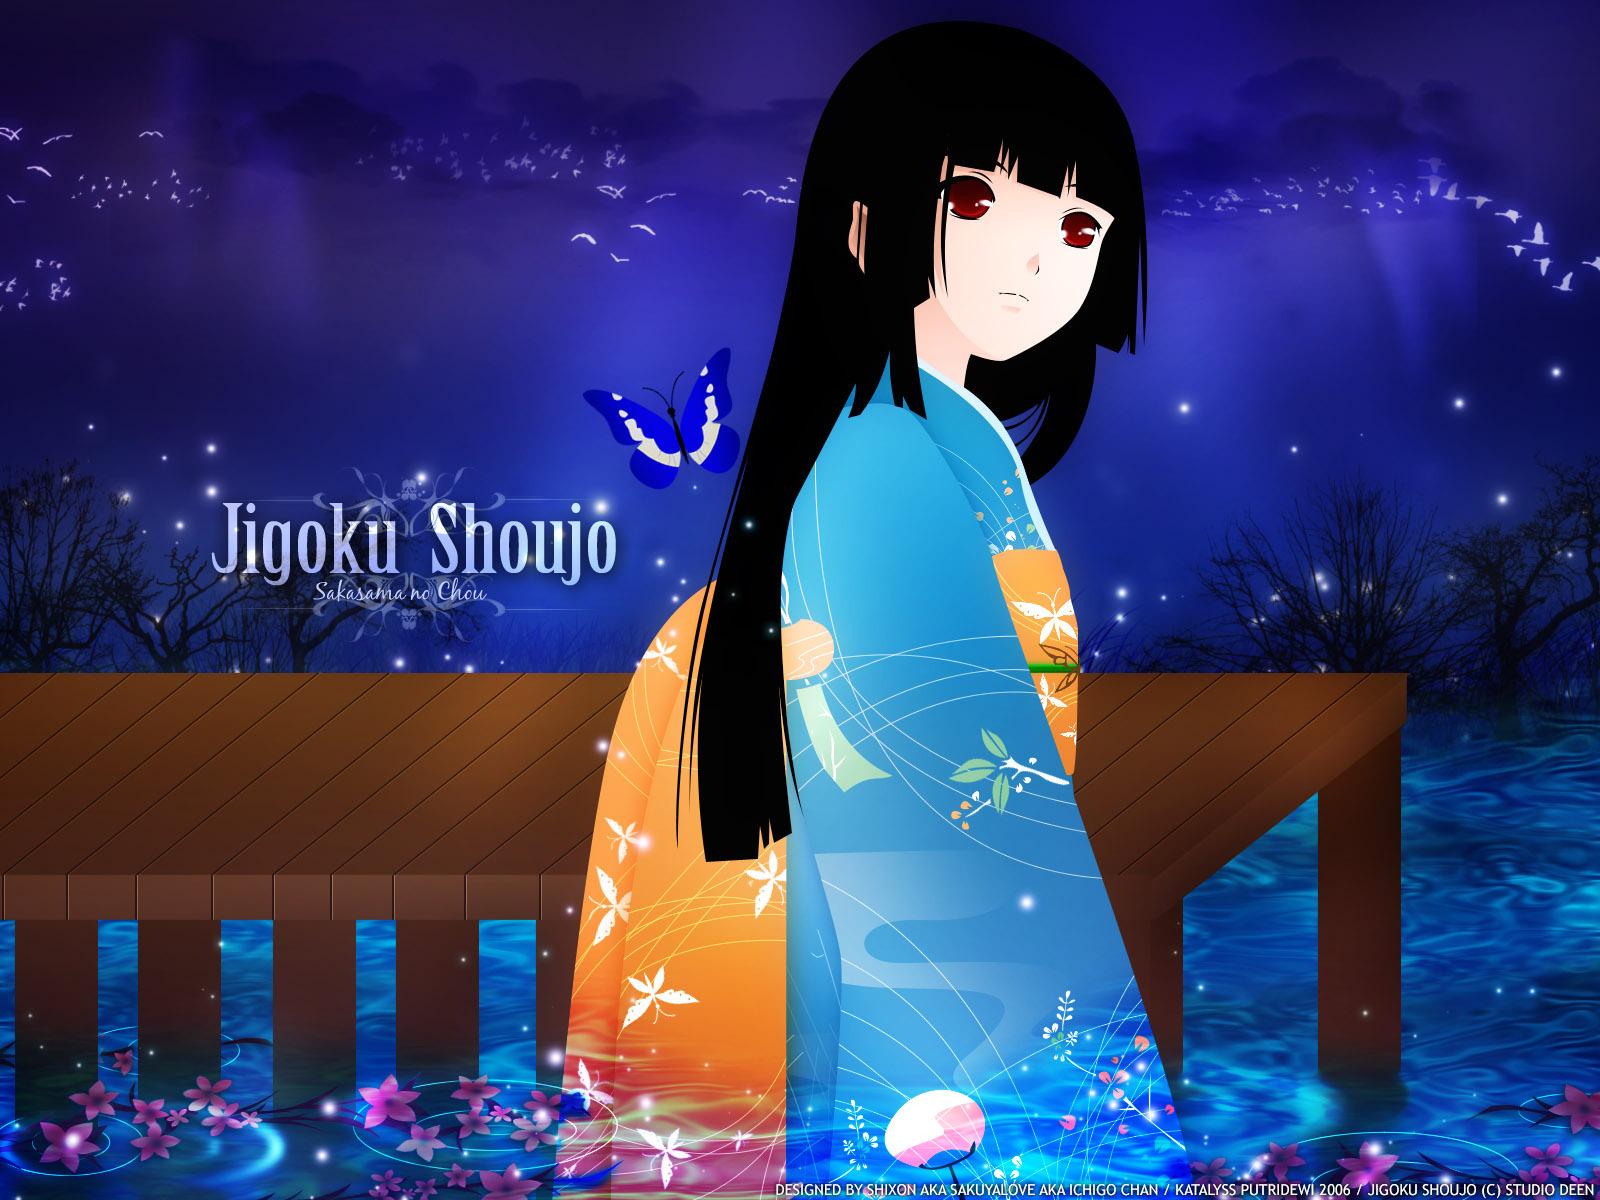 how to make a jigoku shoujo website